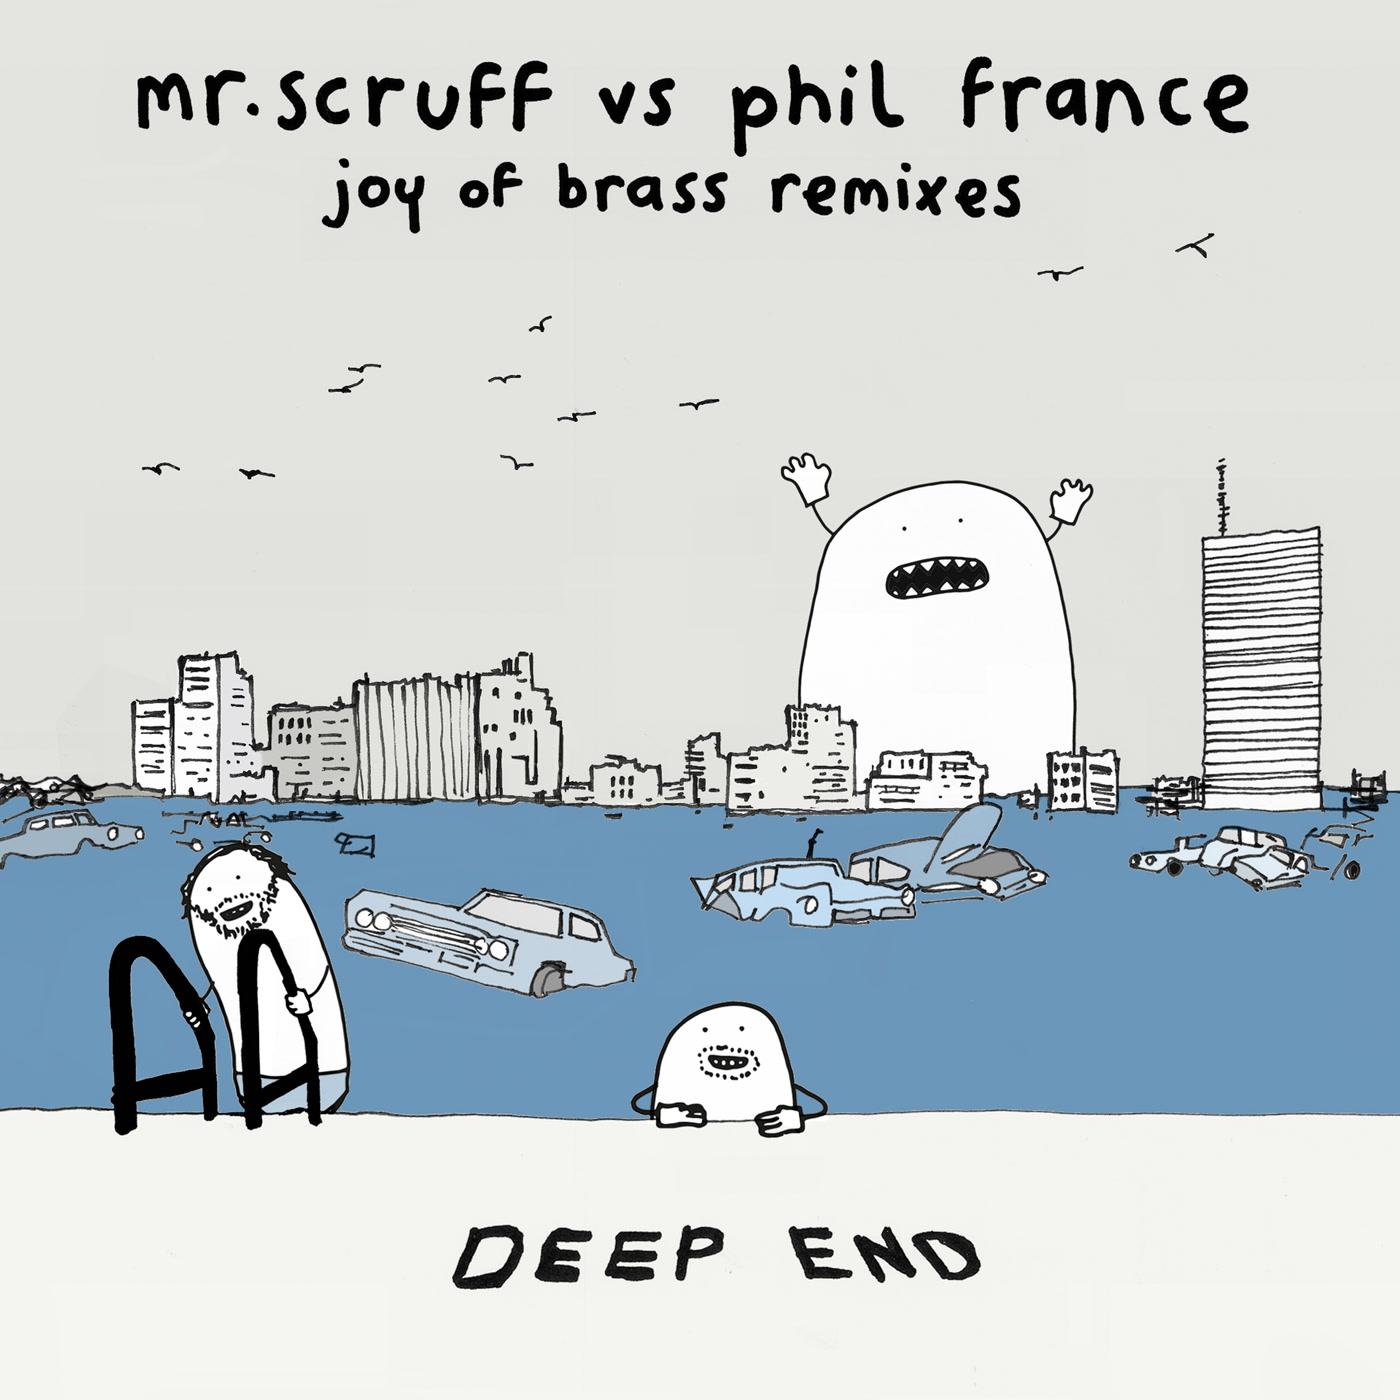 joy-of-brass-remixes-mr-scruff-vs-phil-france-phil-france-mr-scruff